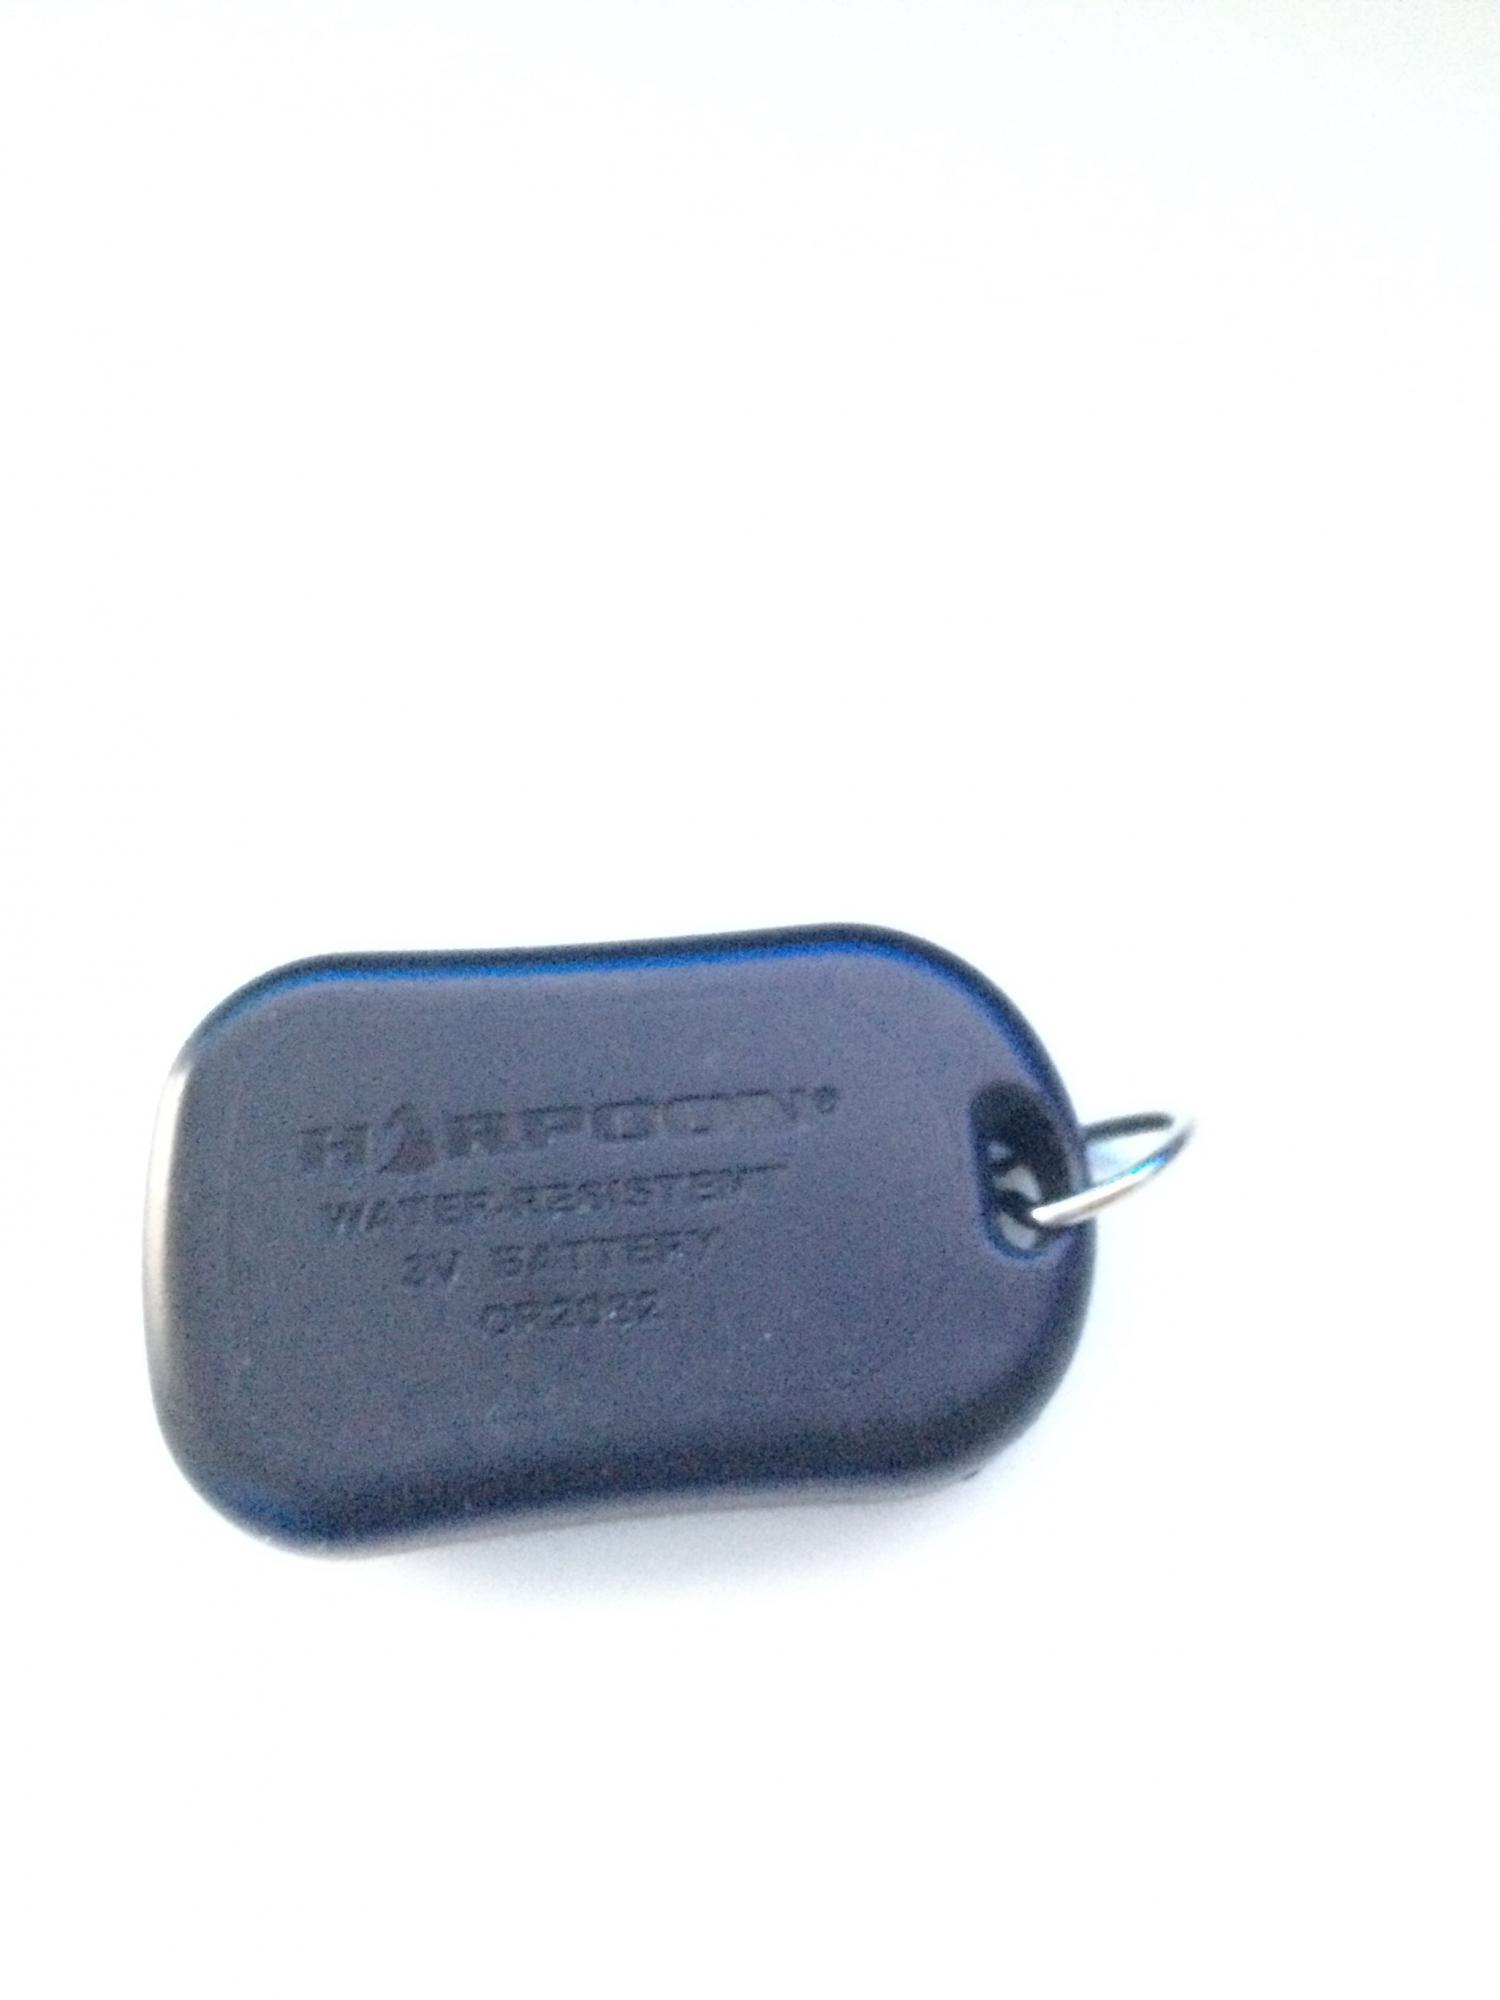 Harpoon bs1000 сигнализация 89150925055 купить 2